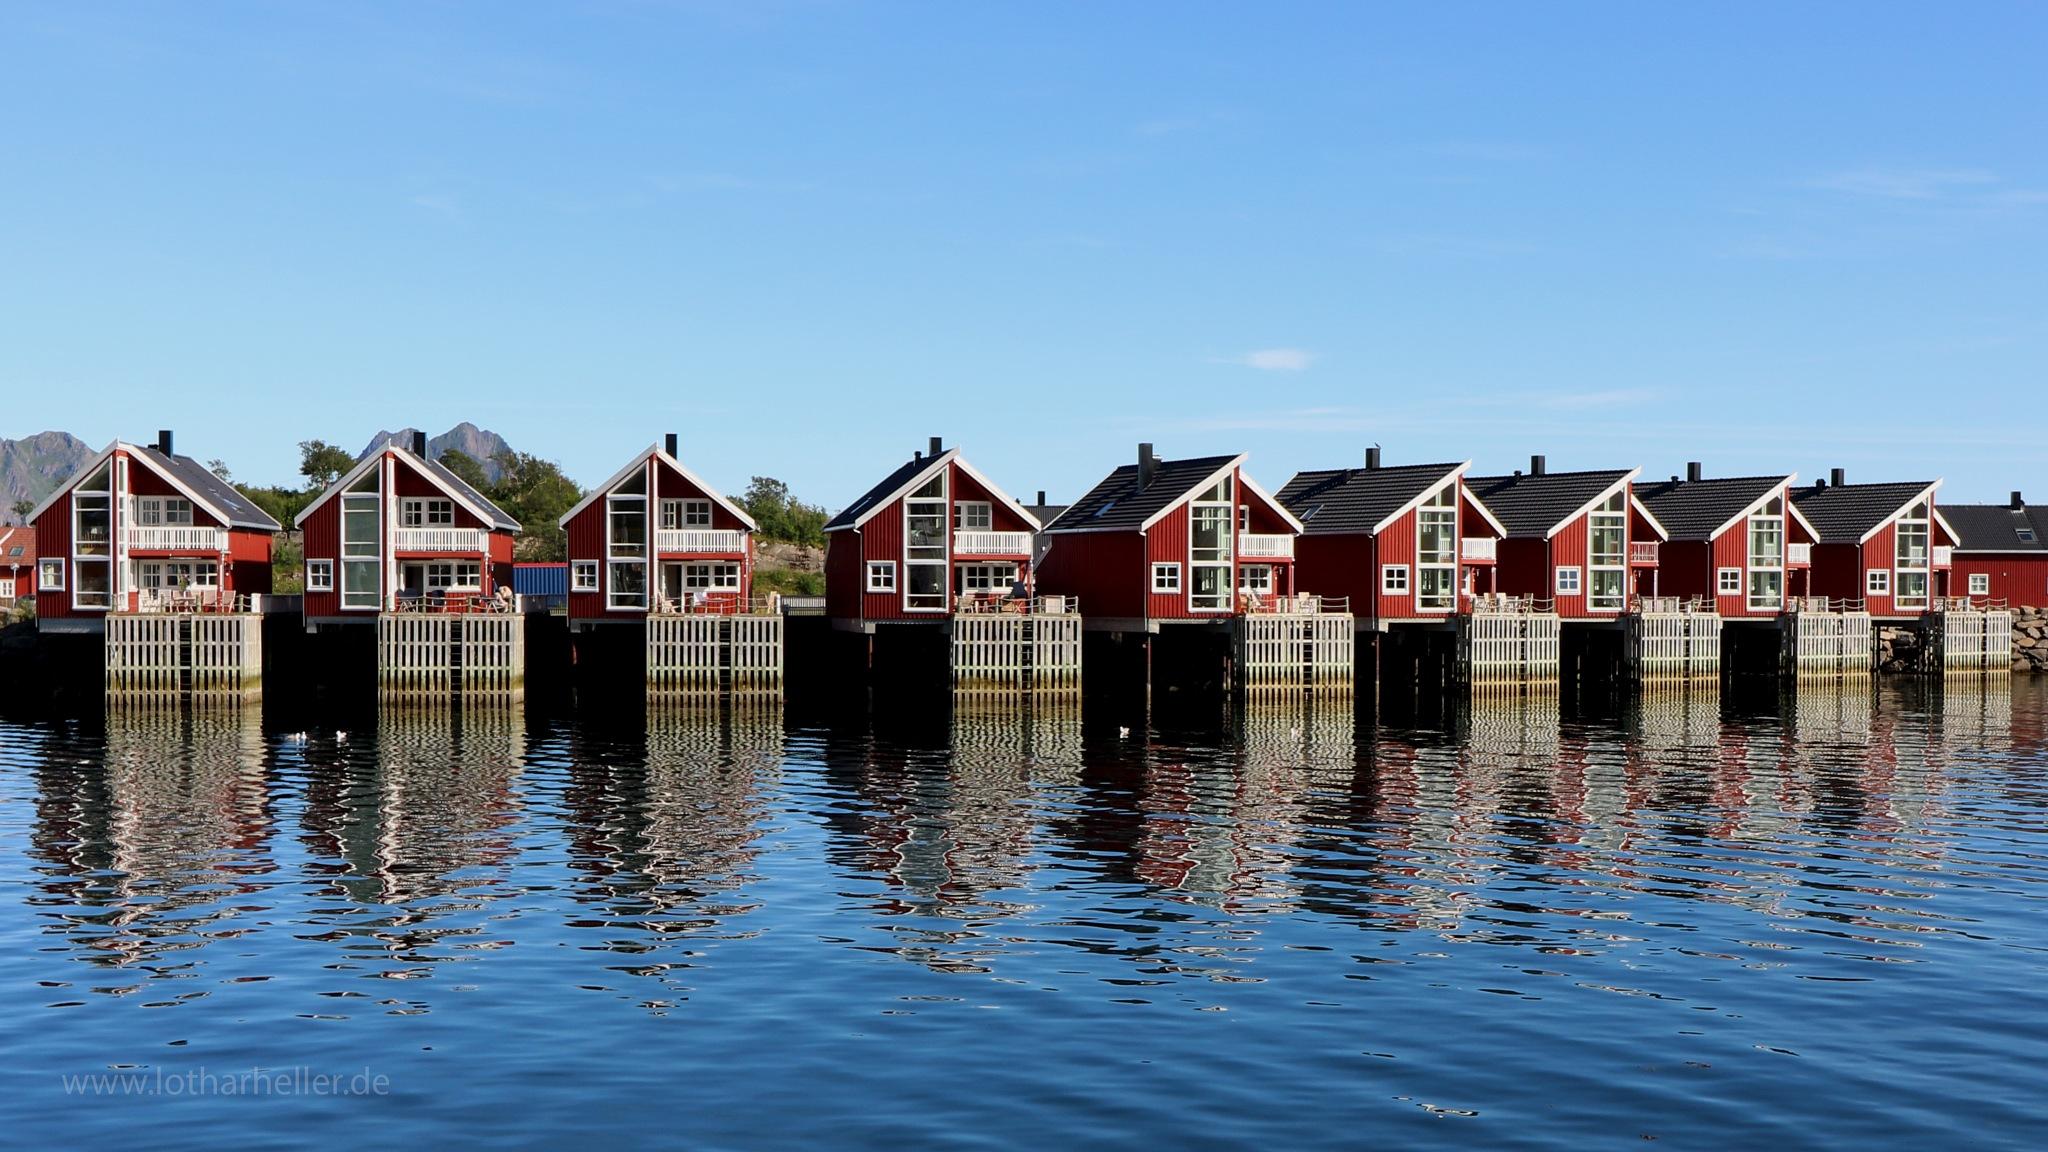 Lofoten Houses by Lothar Heller